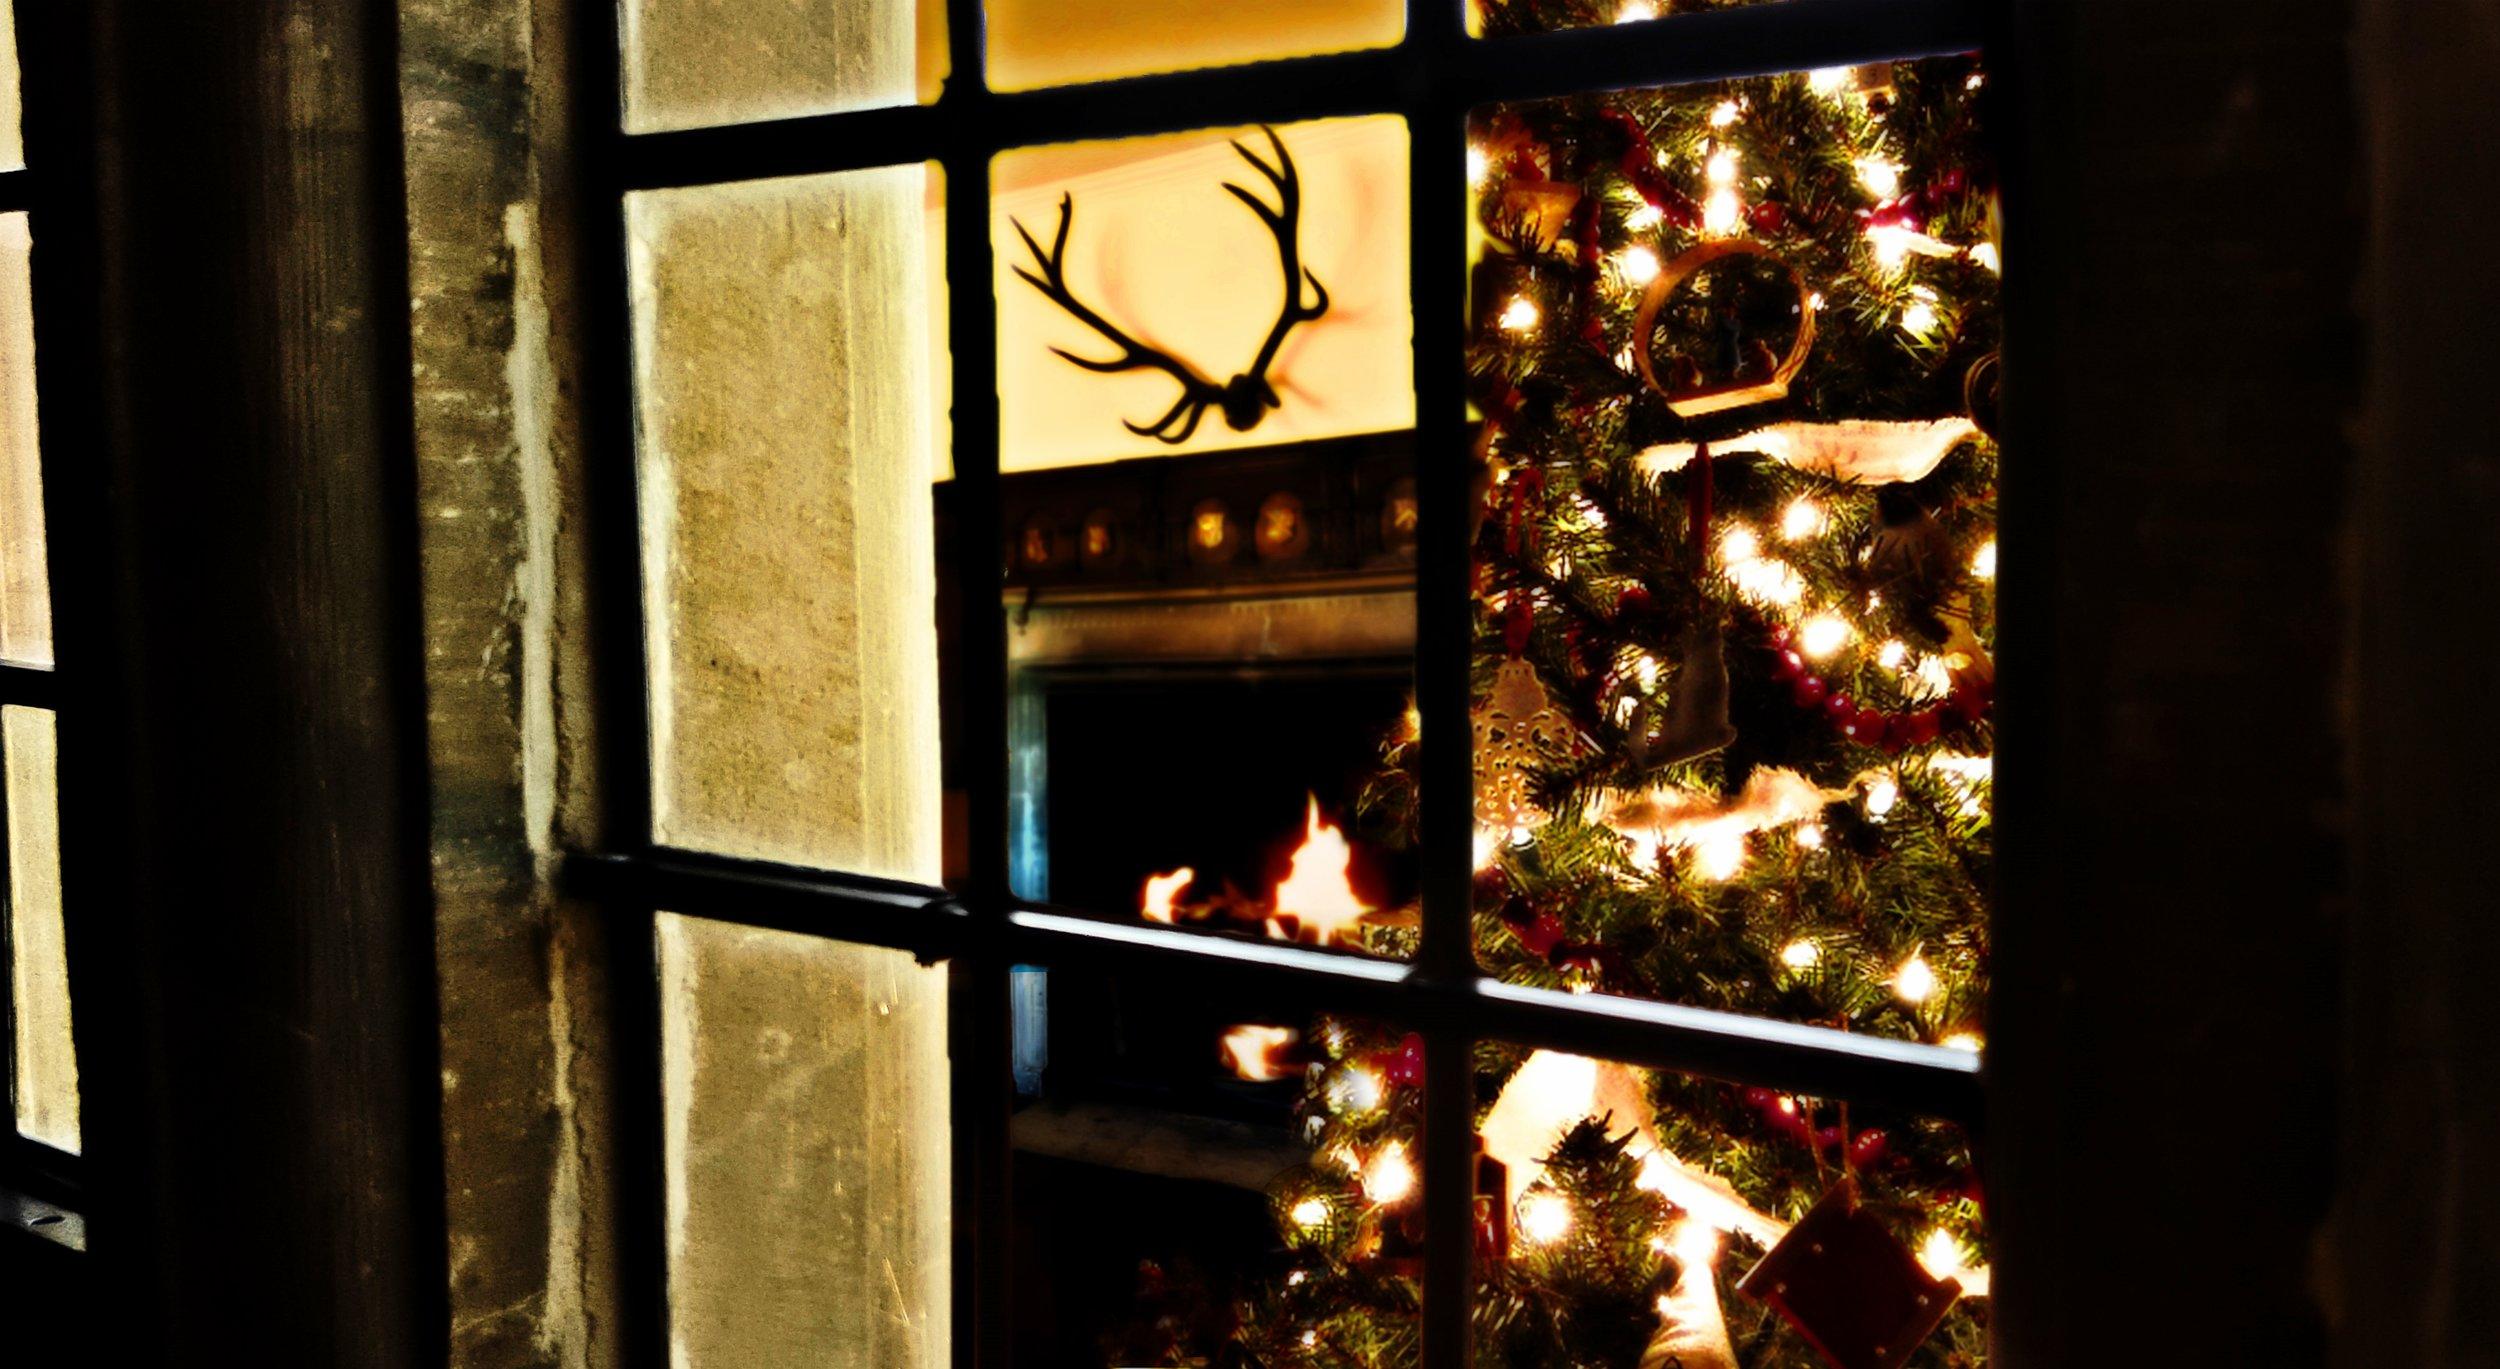 Peeking through the window into the Great Hall - courtesy of Julia Grantham